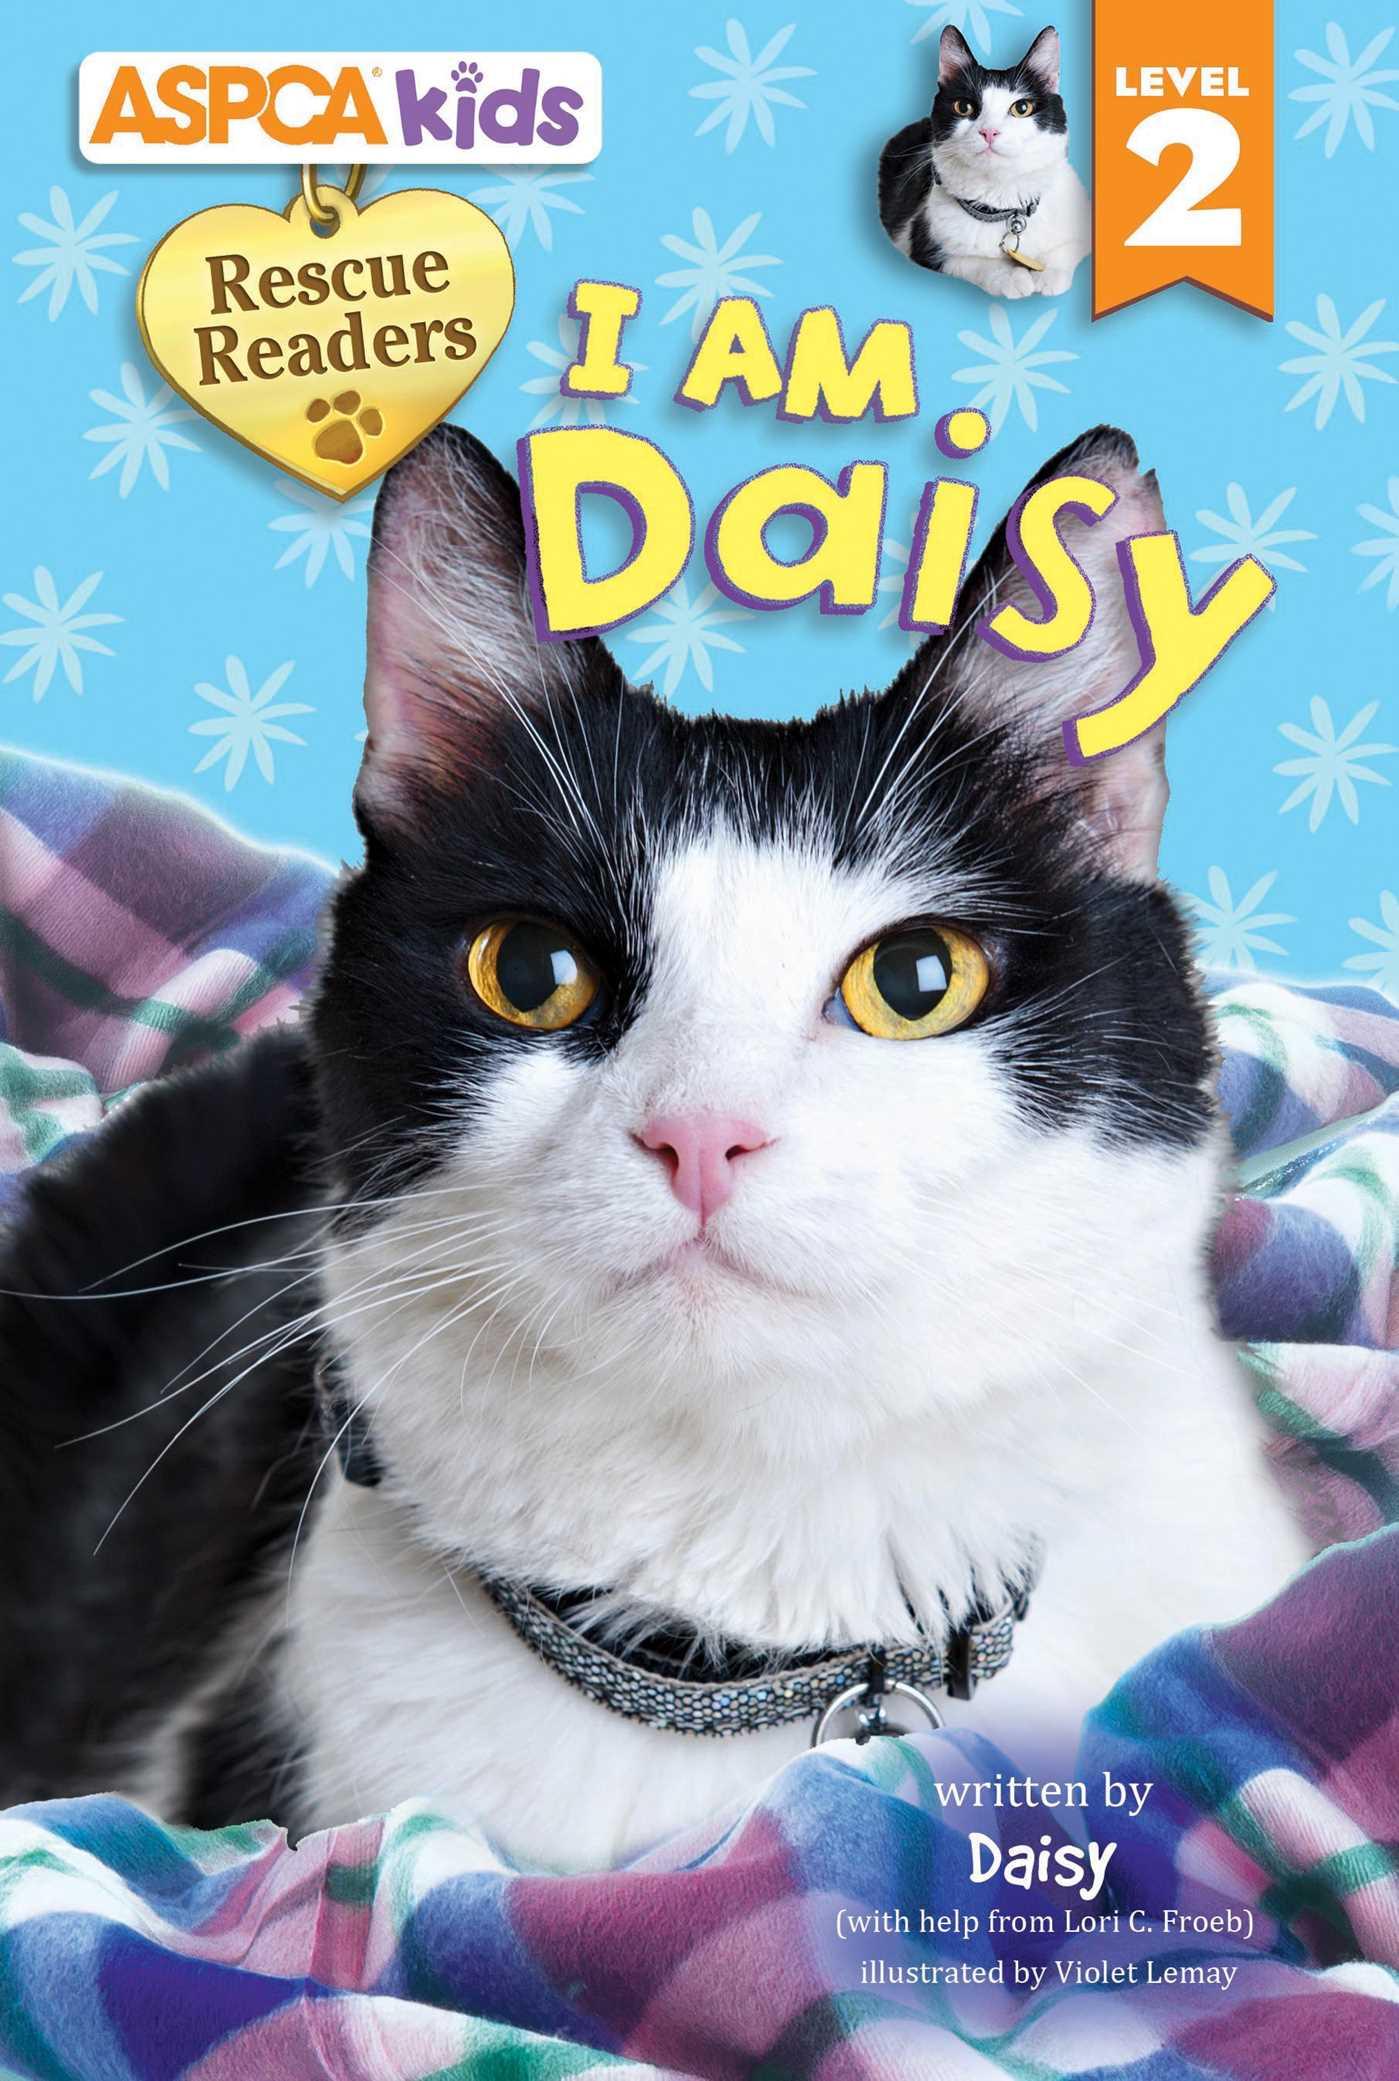 ASPCA kids: Rescue Readers: I Am Daisy | Book by Lori C. Froeb ...